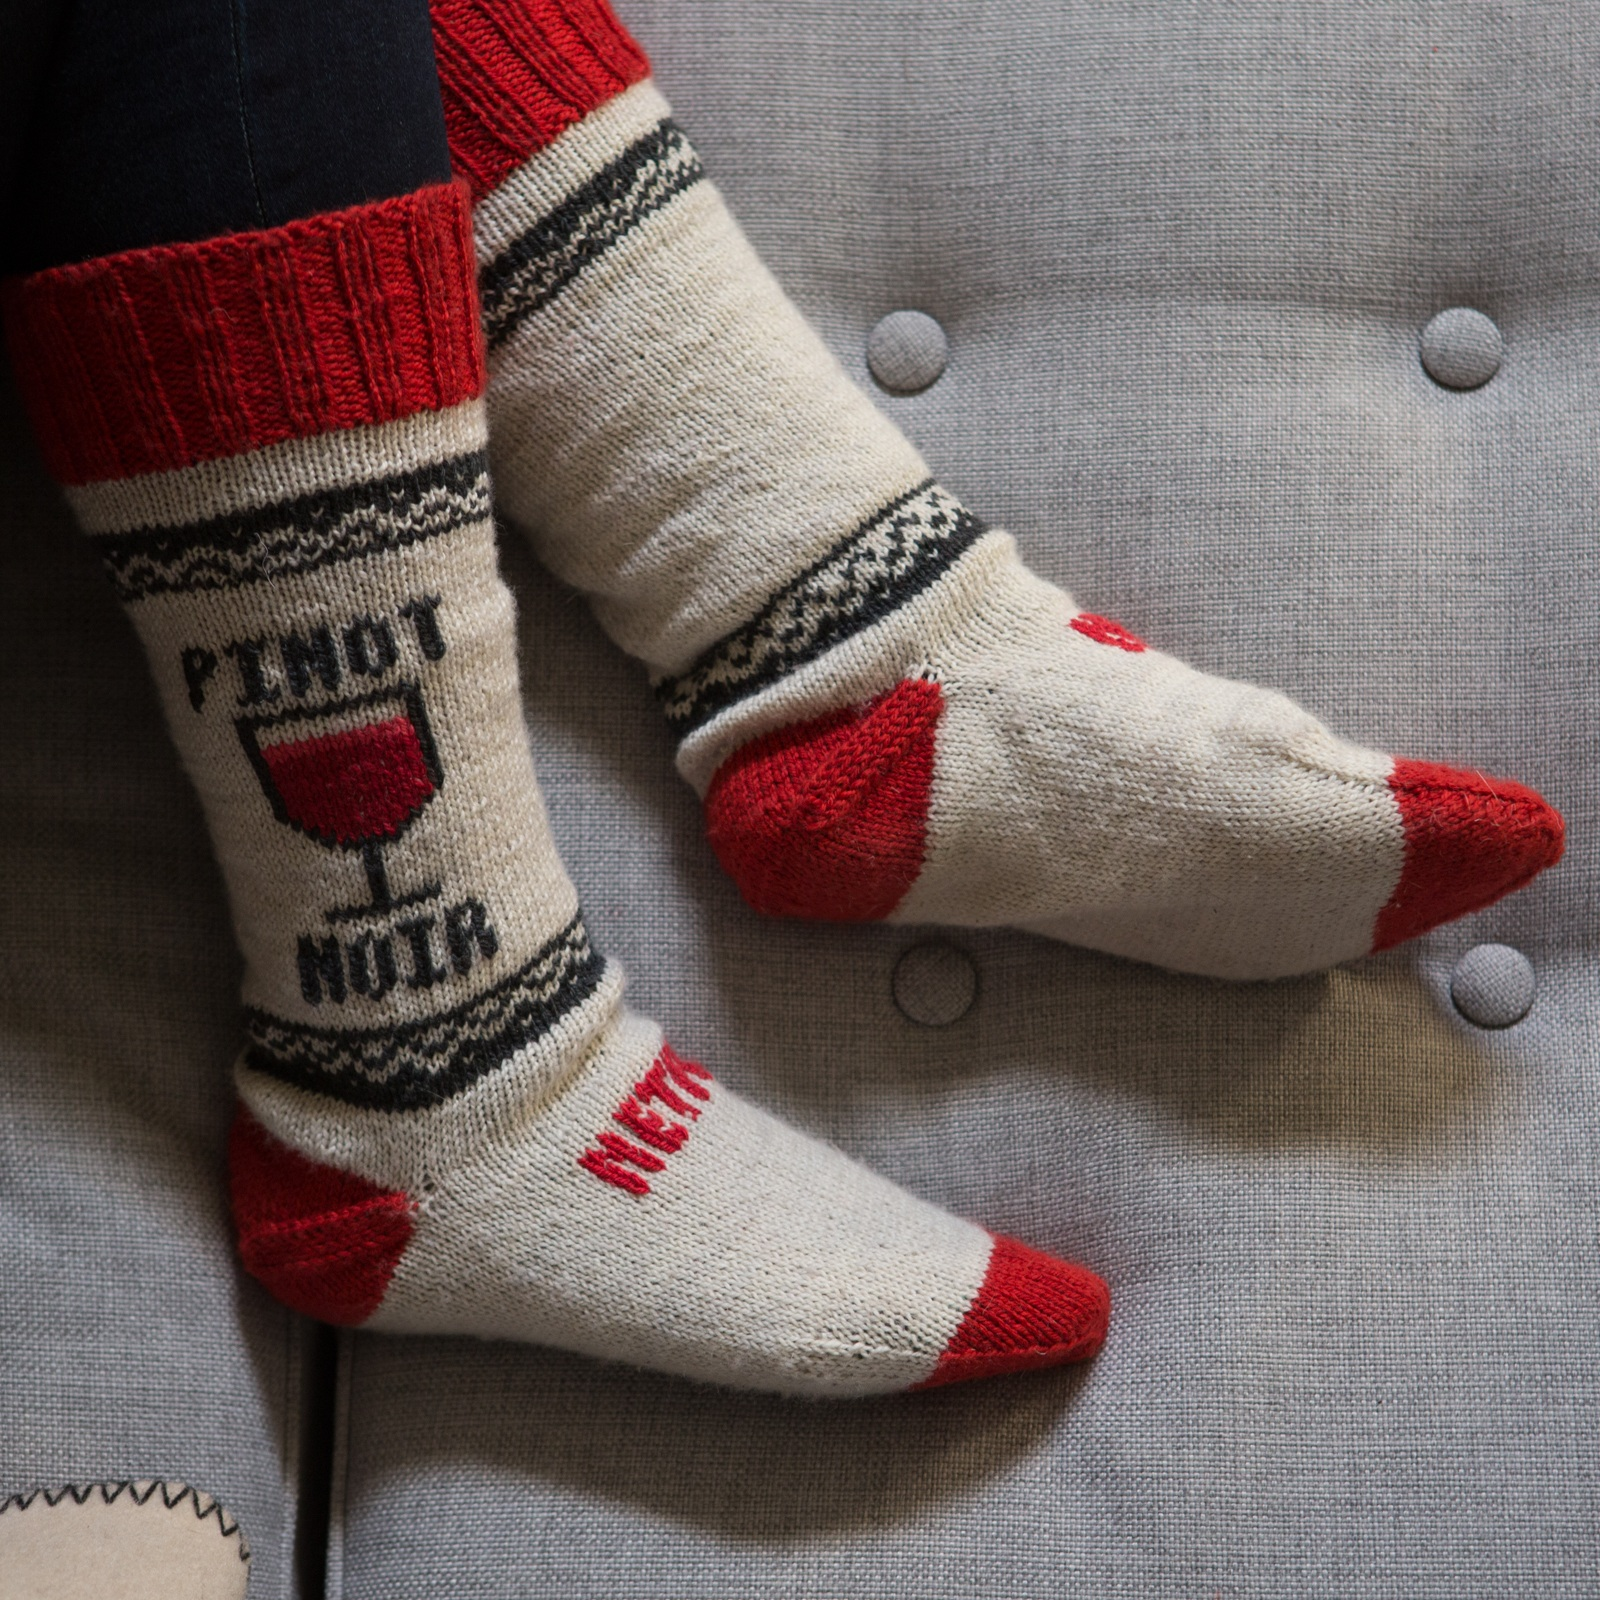 NETFLIX SOCKS - Cozy smart socks automatically pause your show when you doze off.